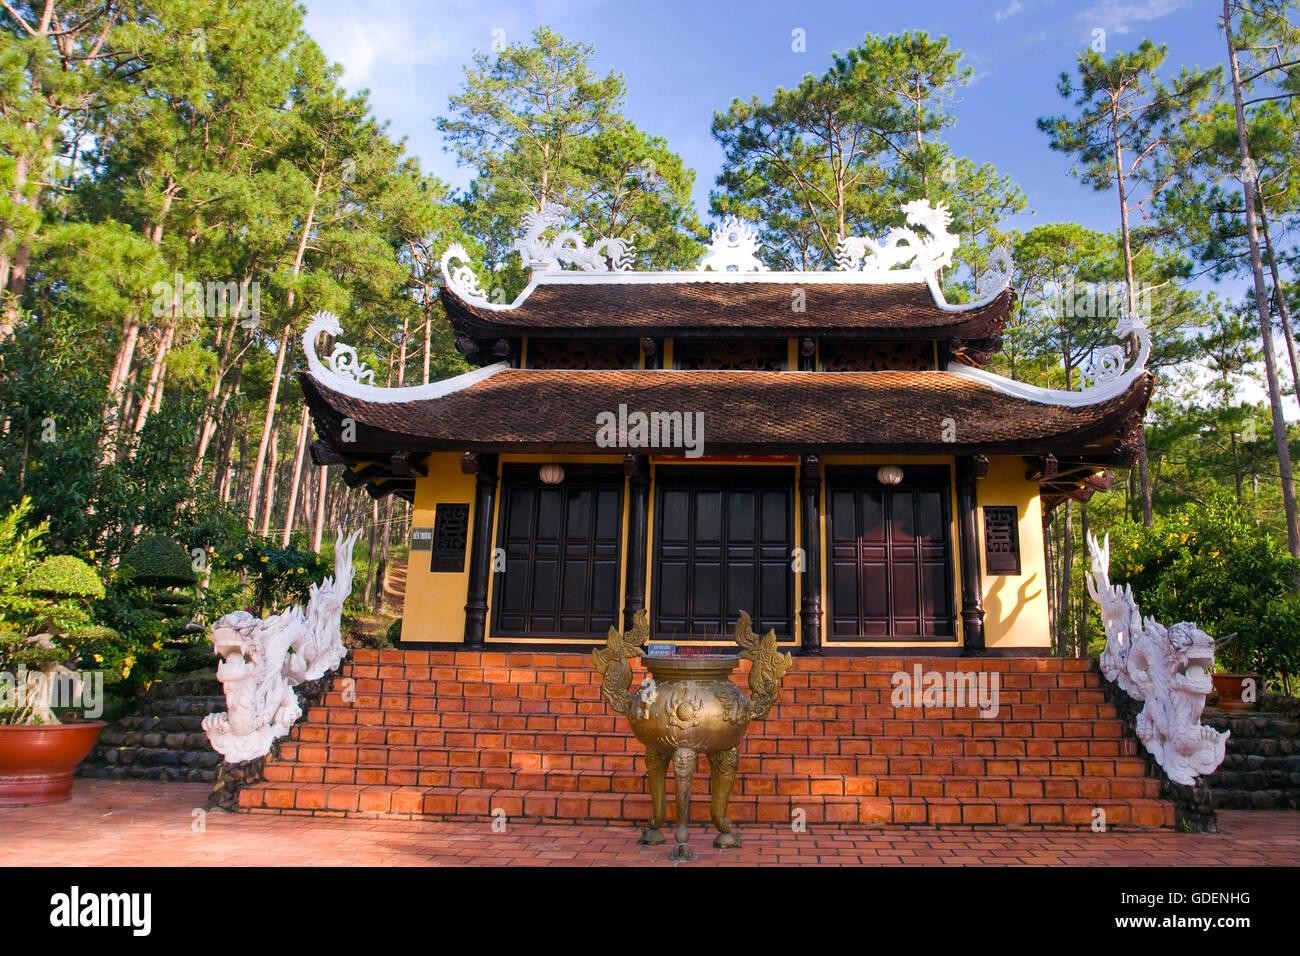 Truc lam Pagoda, central highland, Dalat, Vietnam - Stock Image